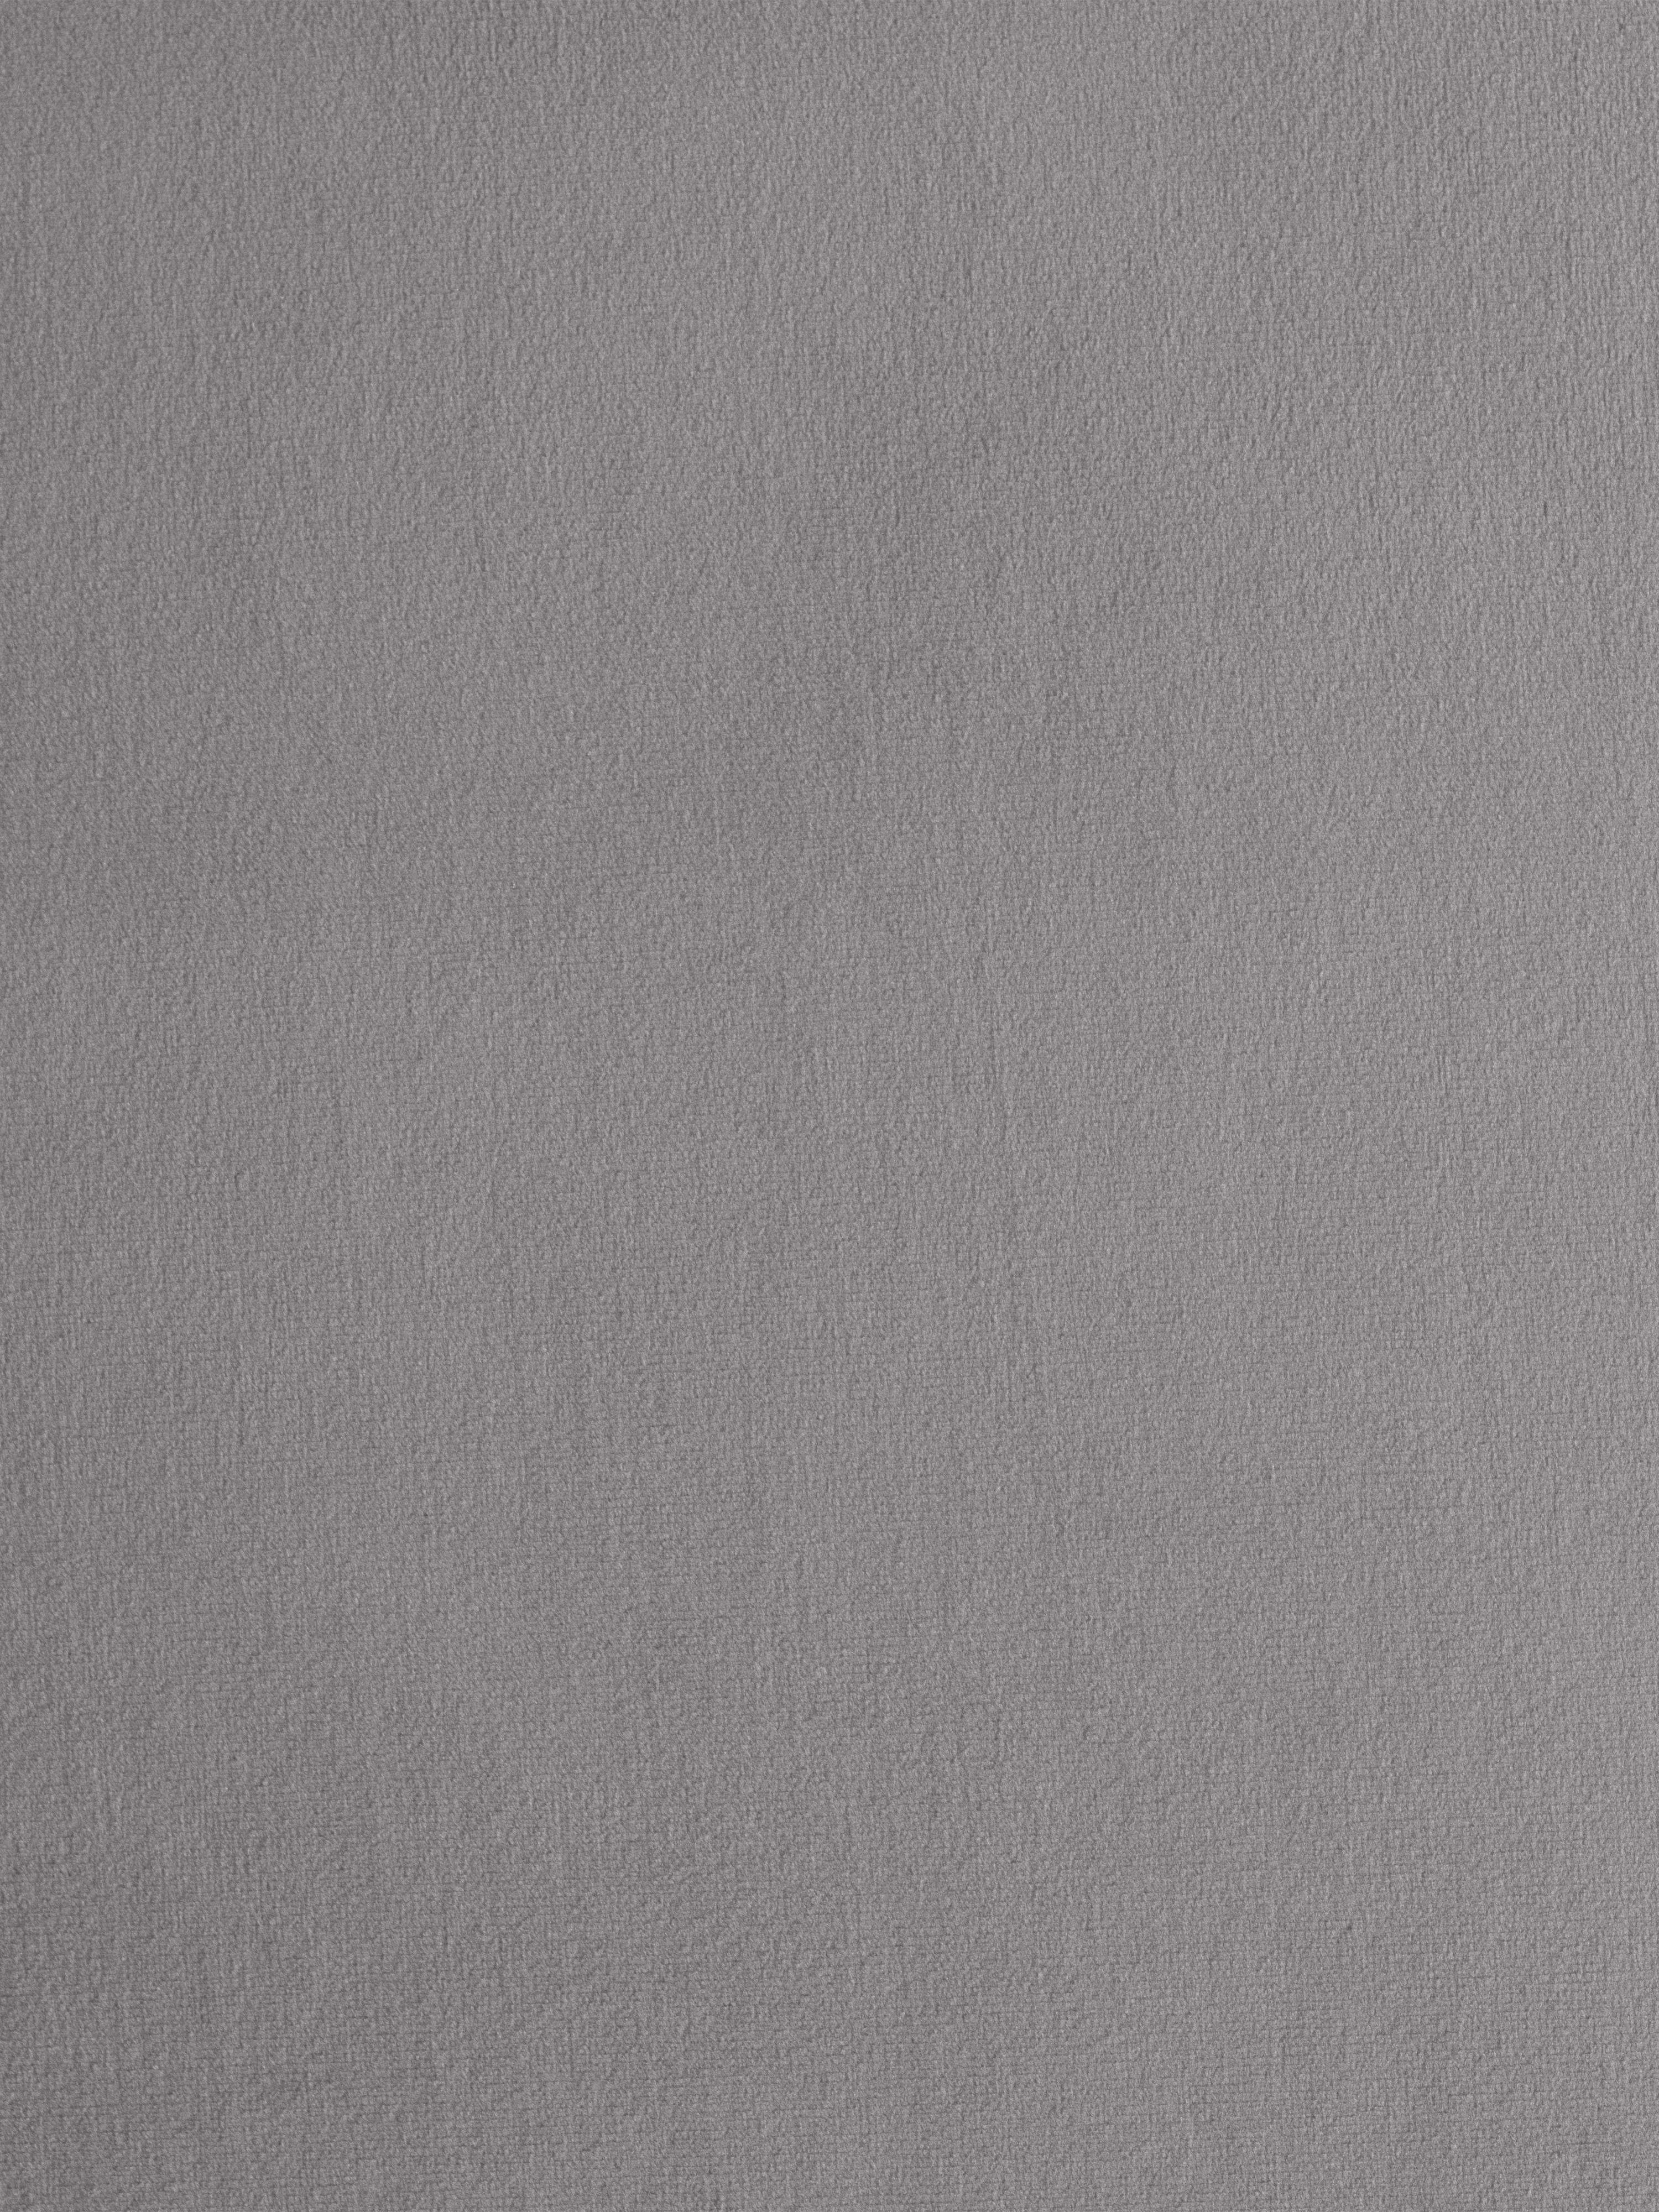 Samt-Sessel Fluente, Bezug: Samt (Hochwertiger Polyes, Gestell: Massives Kiefernholz, Füße: Metall, pulverbeschichtet, Samt Hellgrau, B 74 x T 85 cm